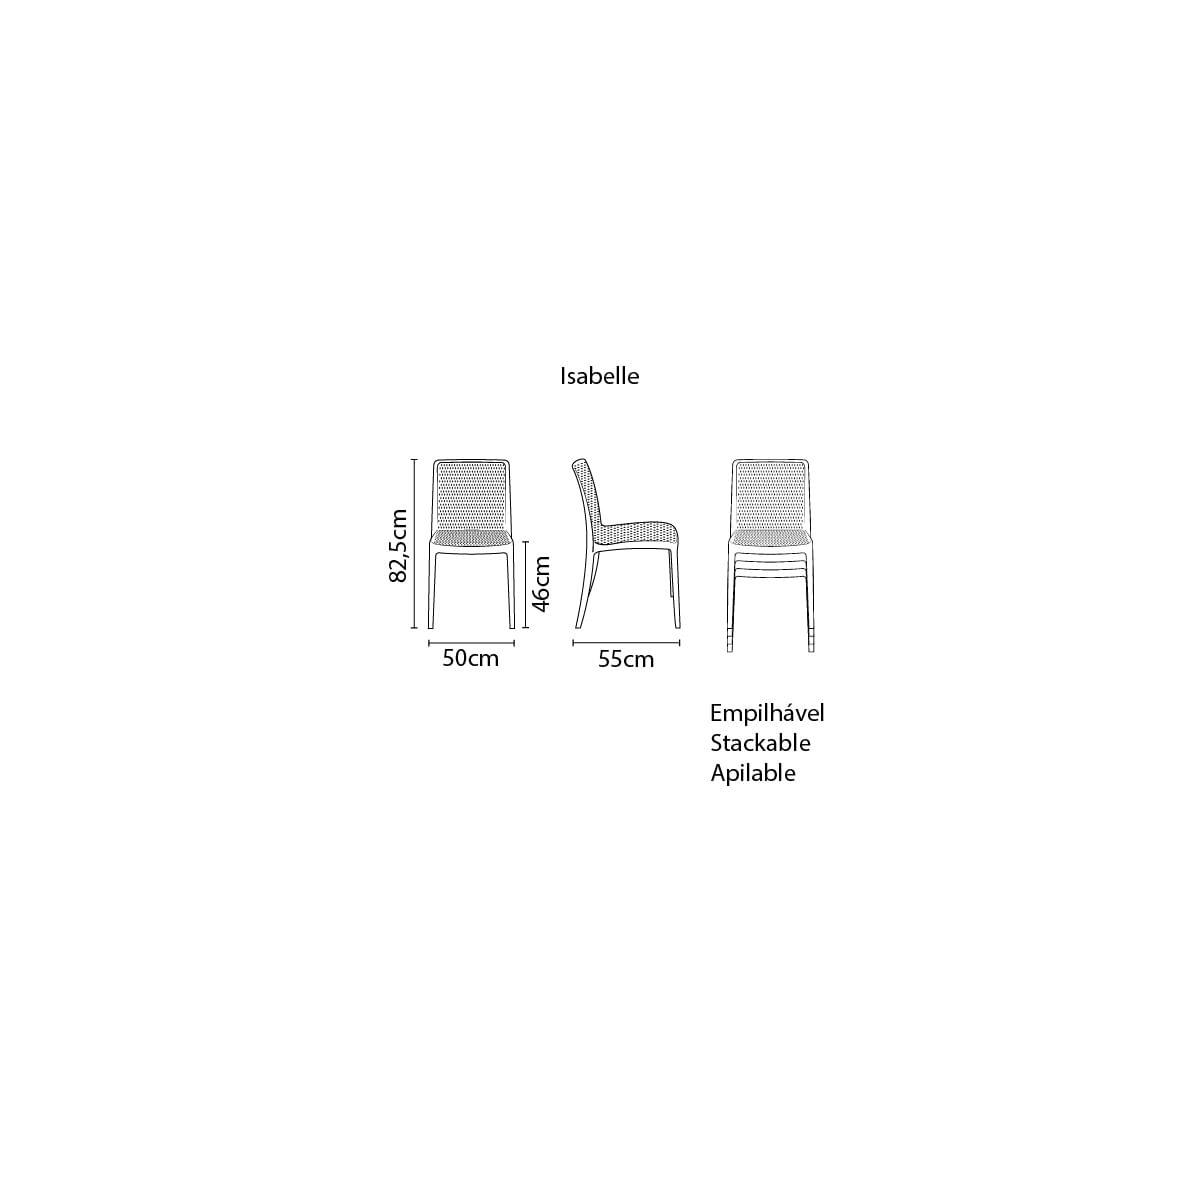 Cadeira Tramontina Isabelle Preta em Polipropileno e Fibra de Vidro